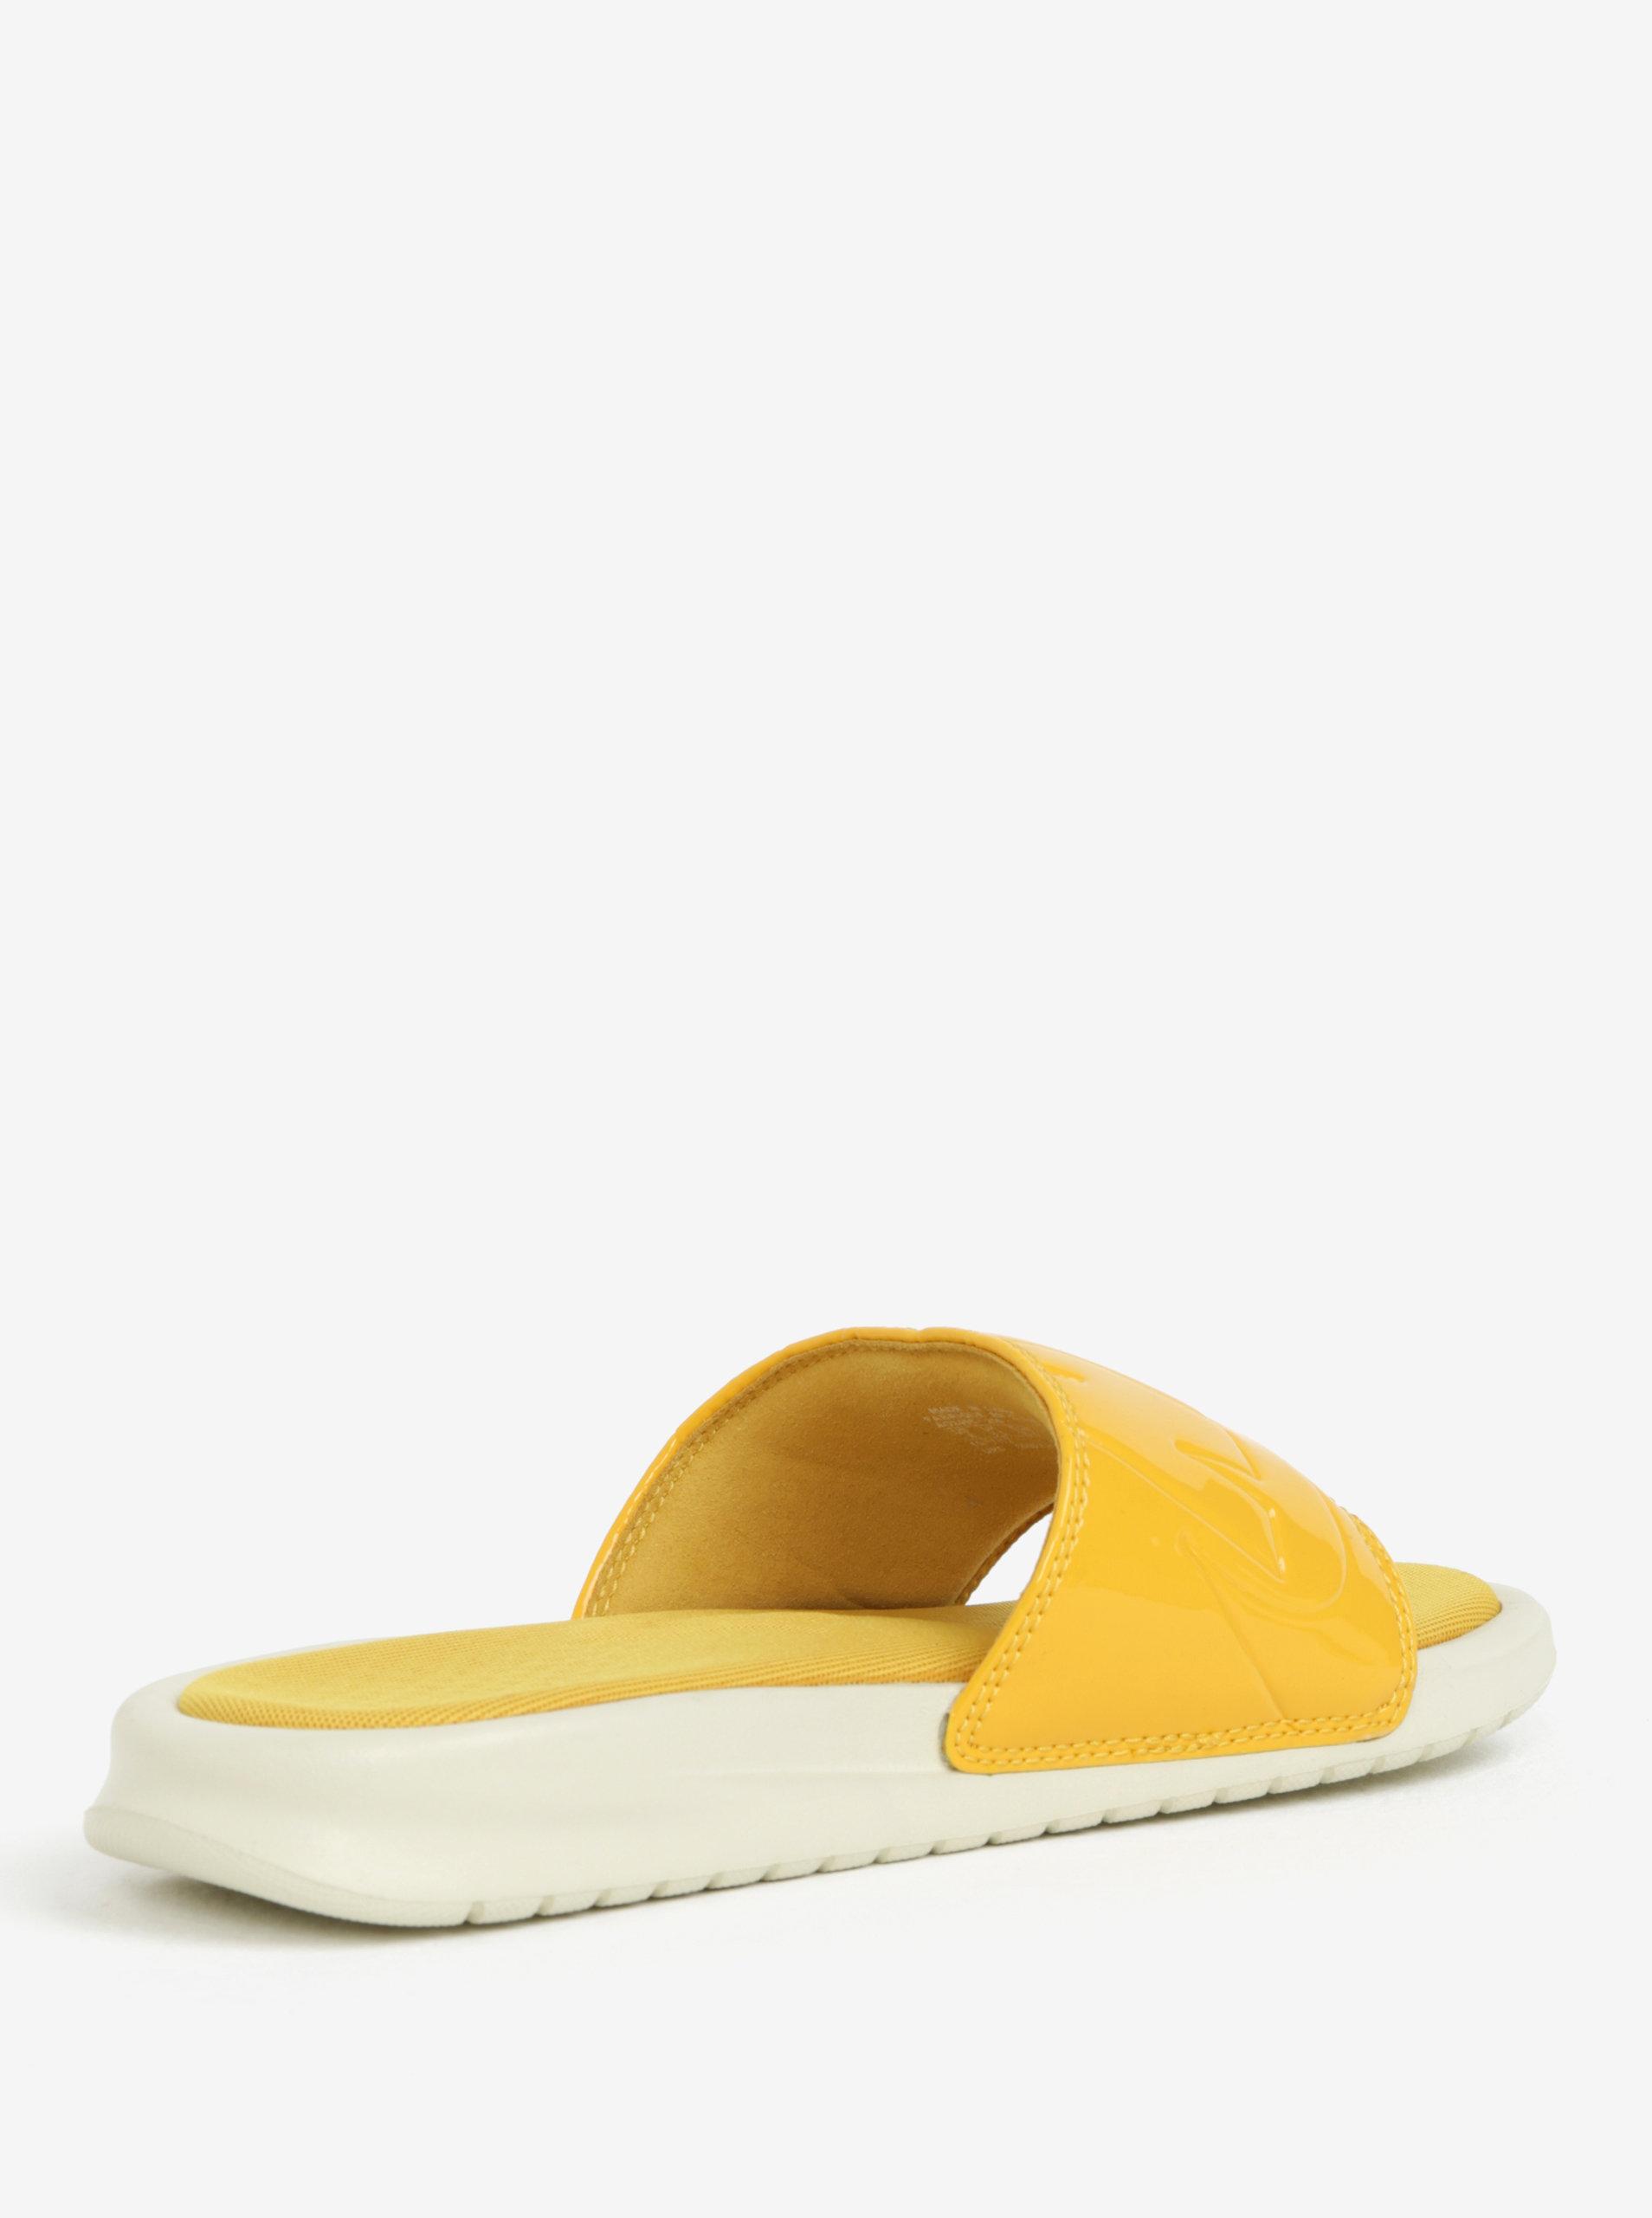 51ccbc95e1cd Žlté dámske šľapky Nike Benassi Jdi ...